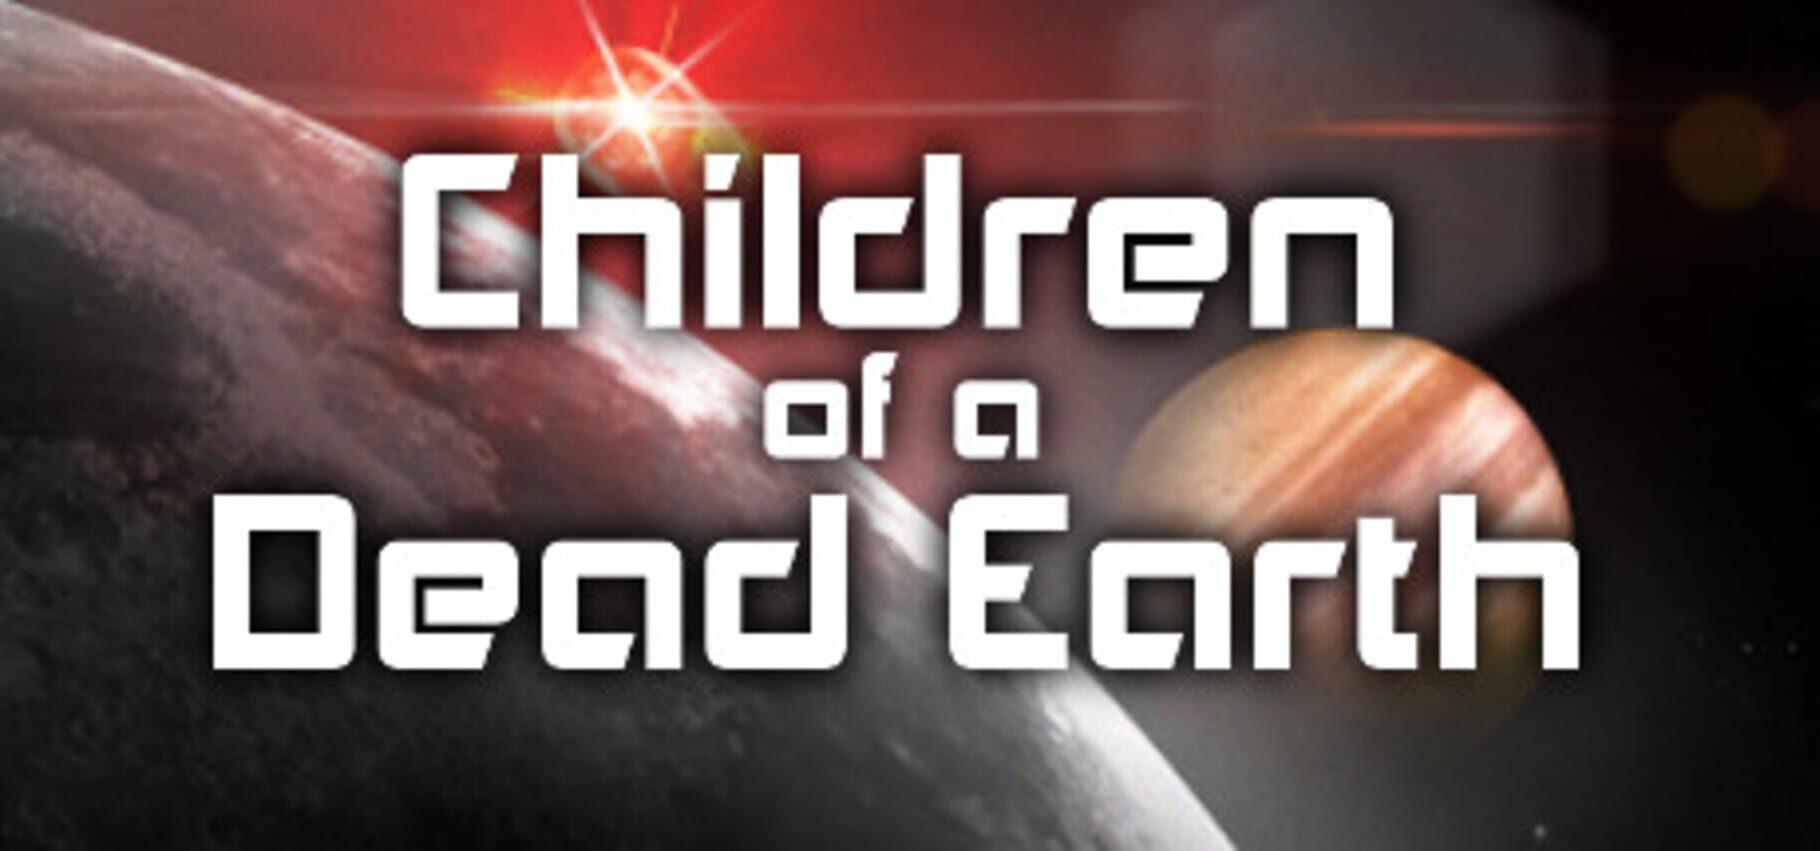 buy Children of a Dead Earth cd key for all platform